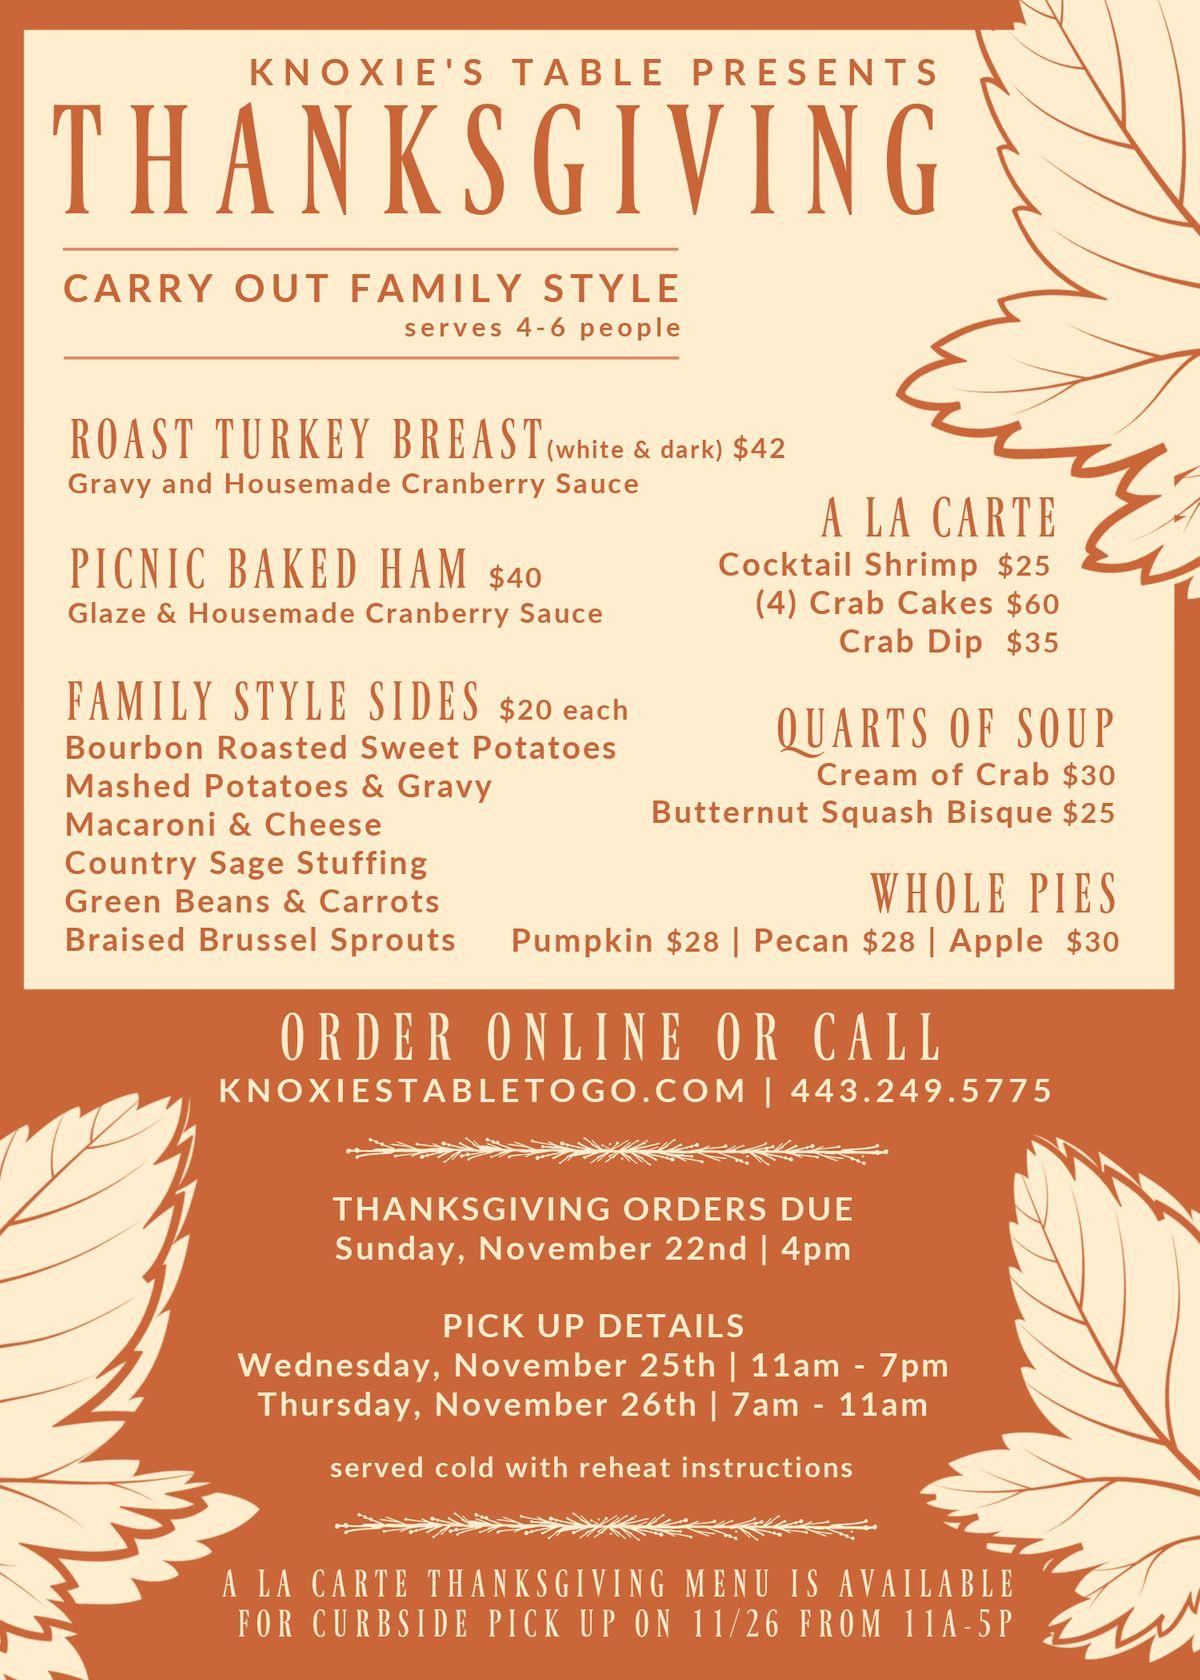 CBBC Thanksgiving 2020 - To Go.jpg